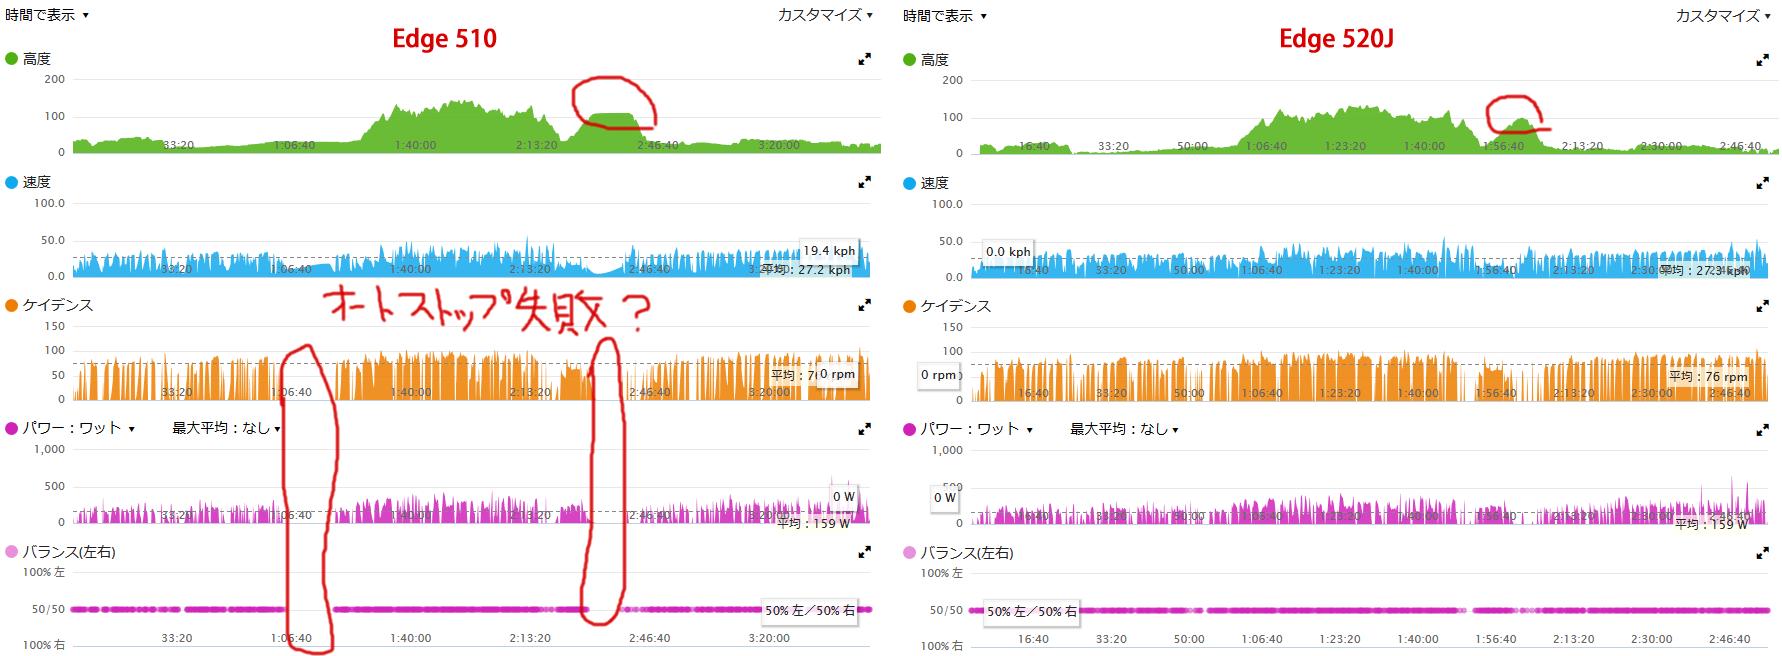 Edge 510と520はグラフで見てもほぼ同じデータでした